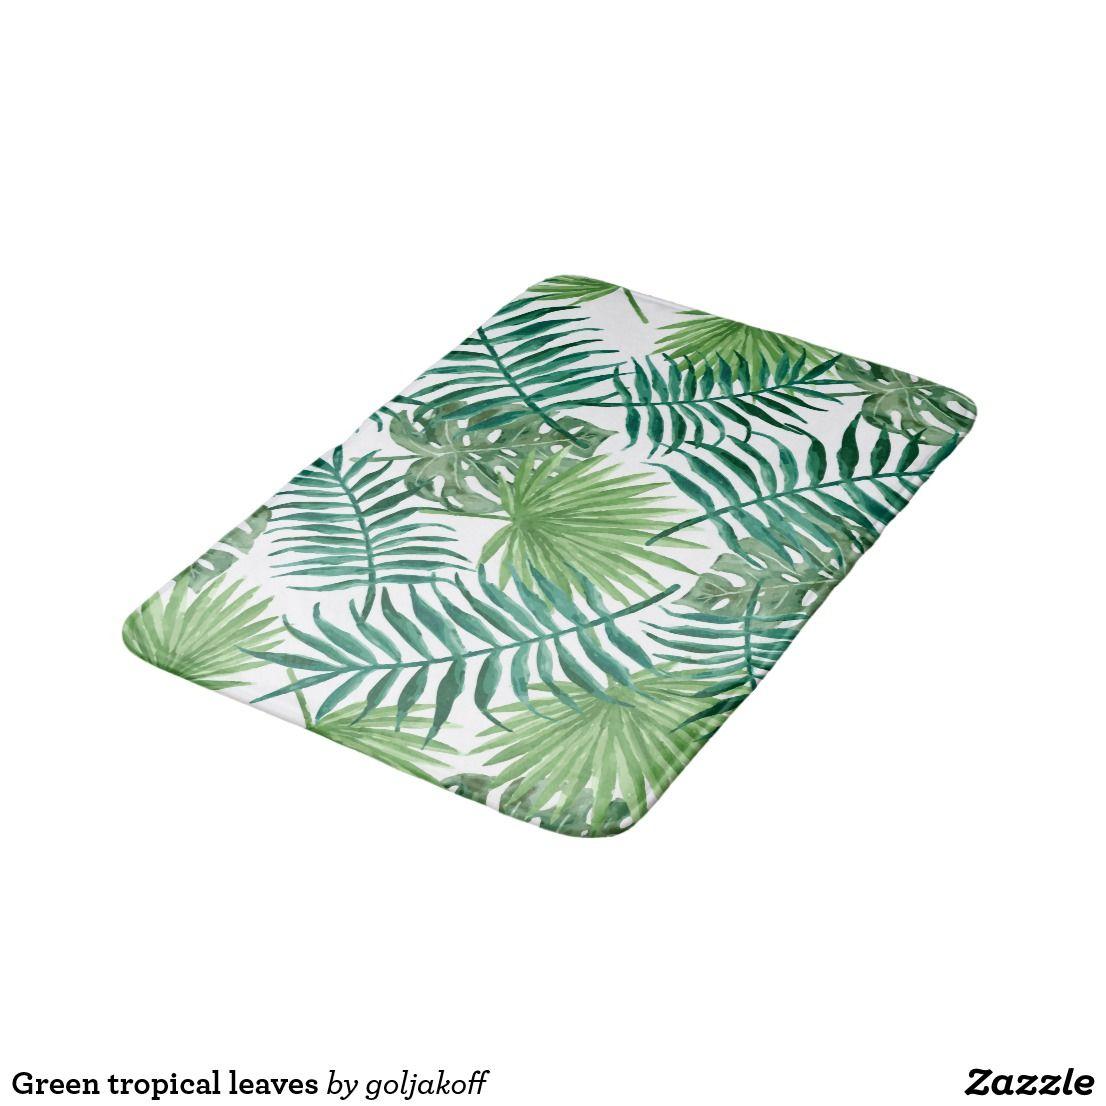 Green Tropical Leaves Bath Mat Zazzle Com Bathroom Mats Bathroom Decor Accessories Palm Tree Bathroom